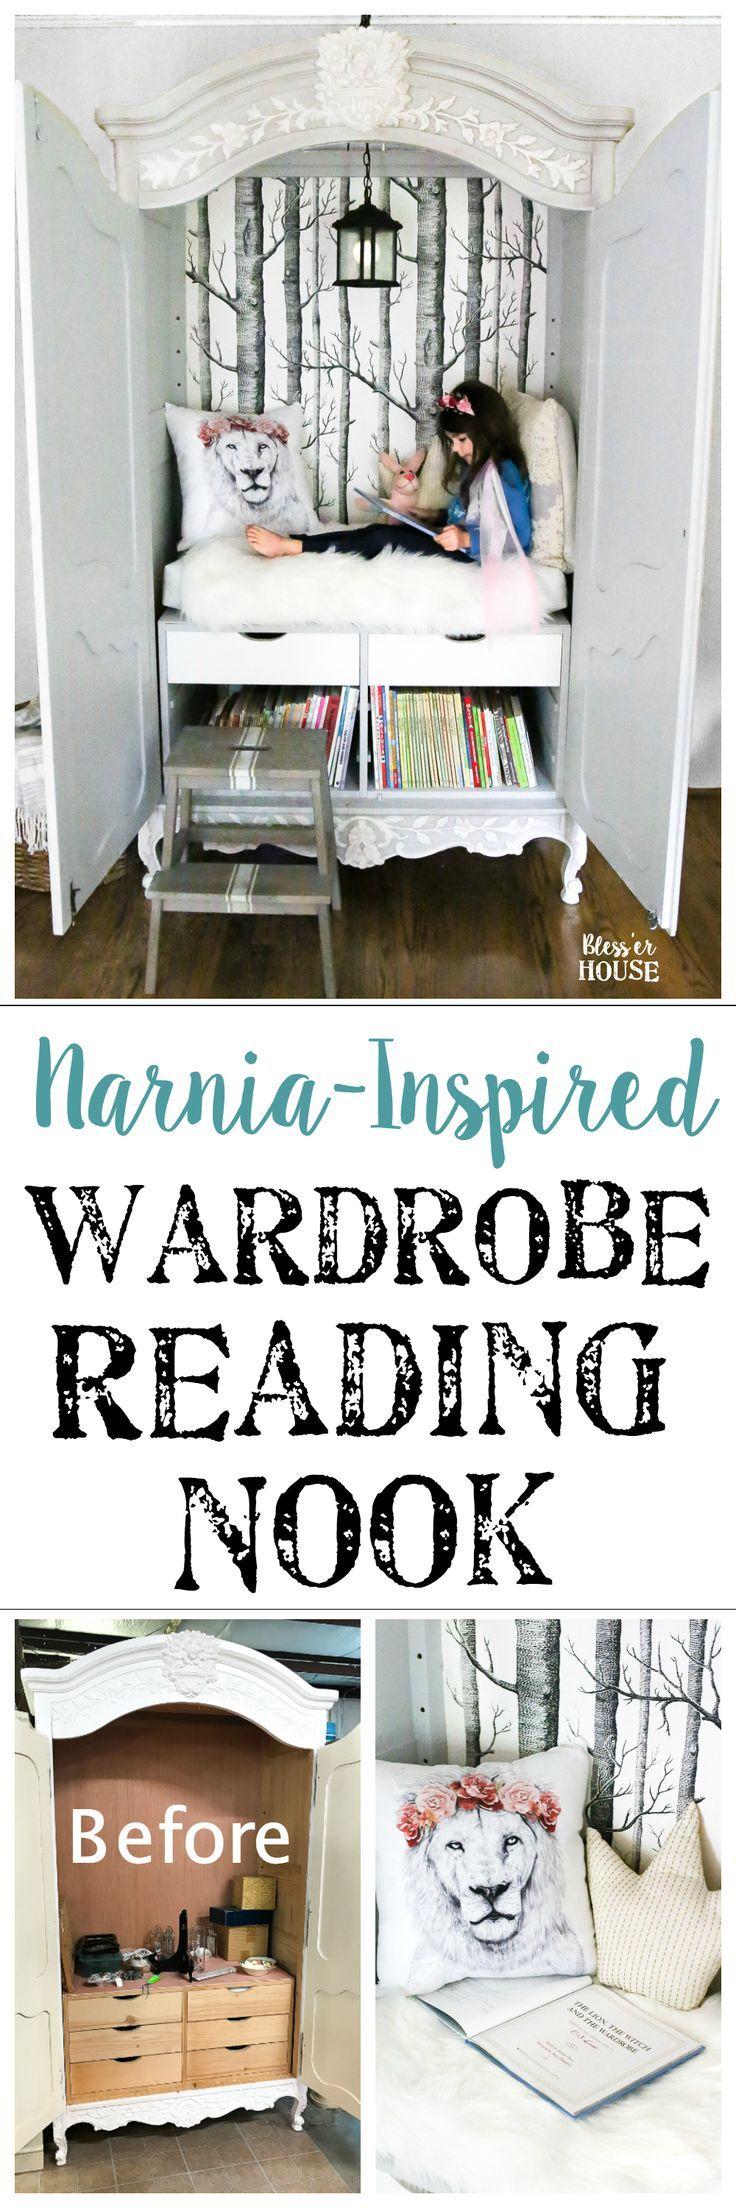 Diy narnia wardrobe reading nook furniture pinterest home